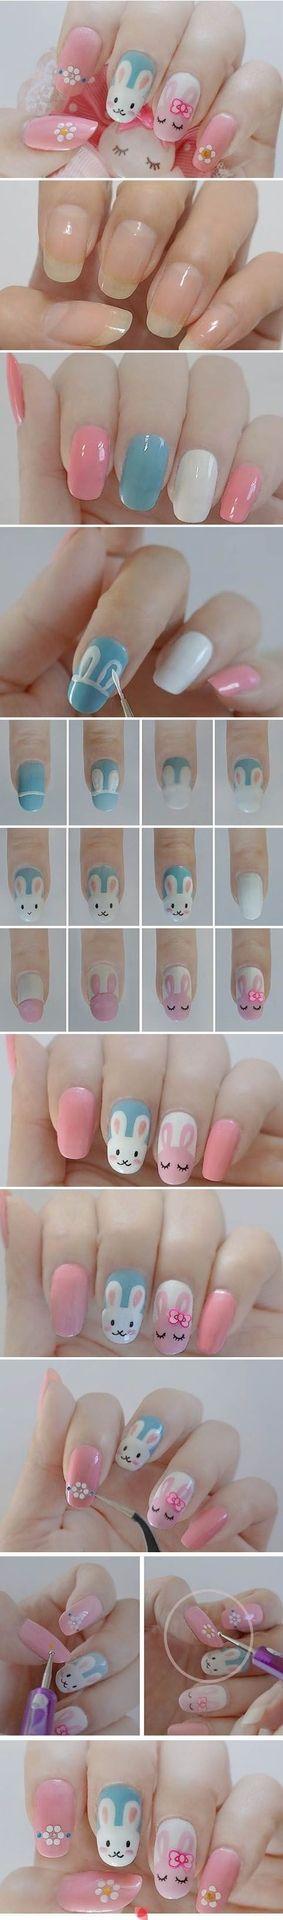 DIY Easter Nails